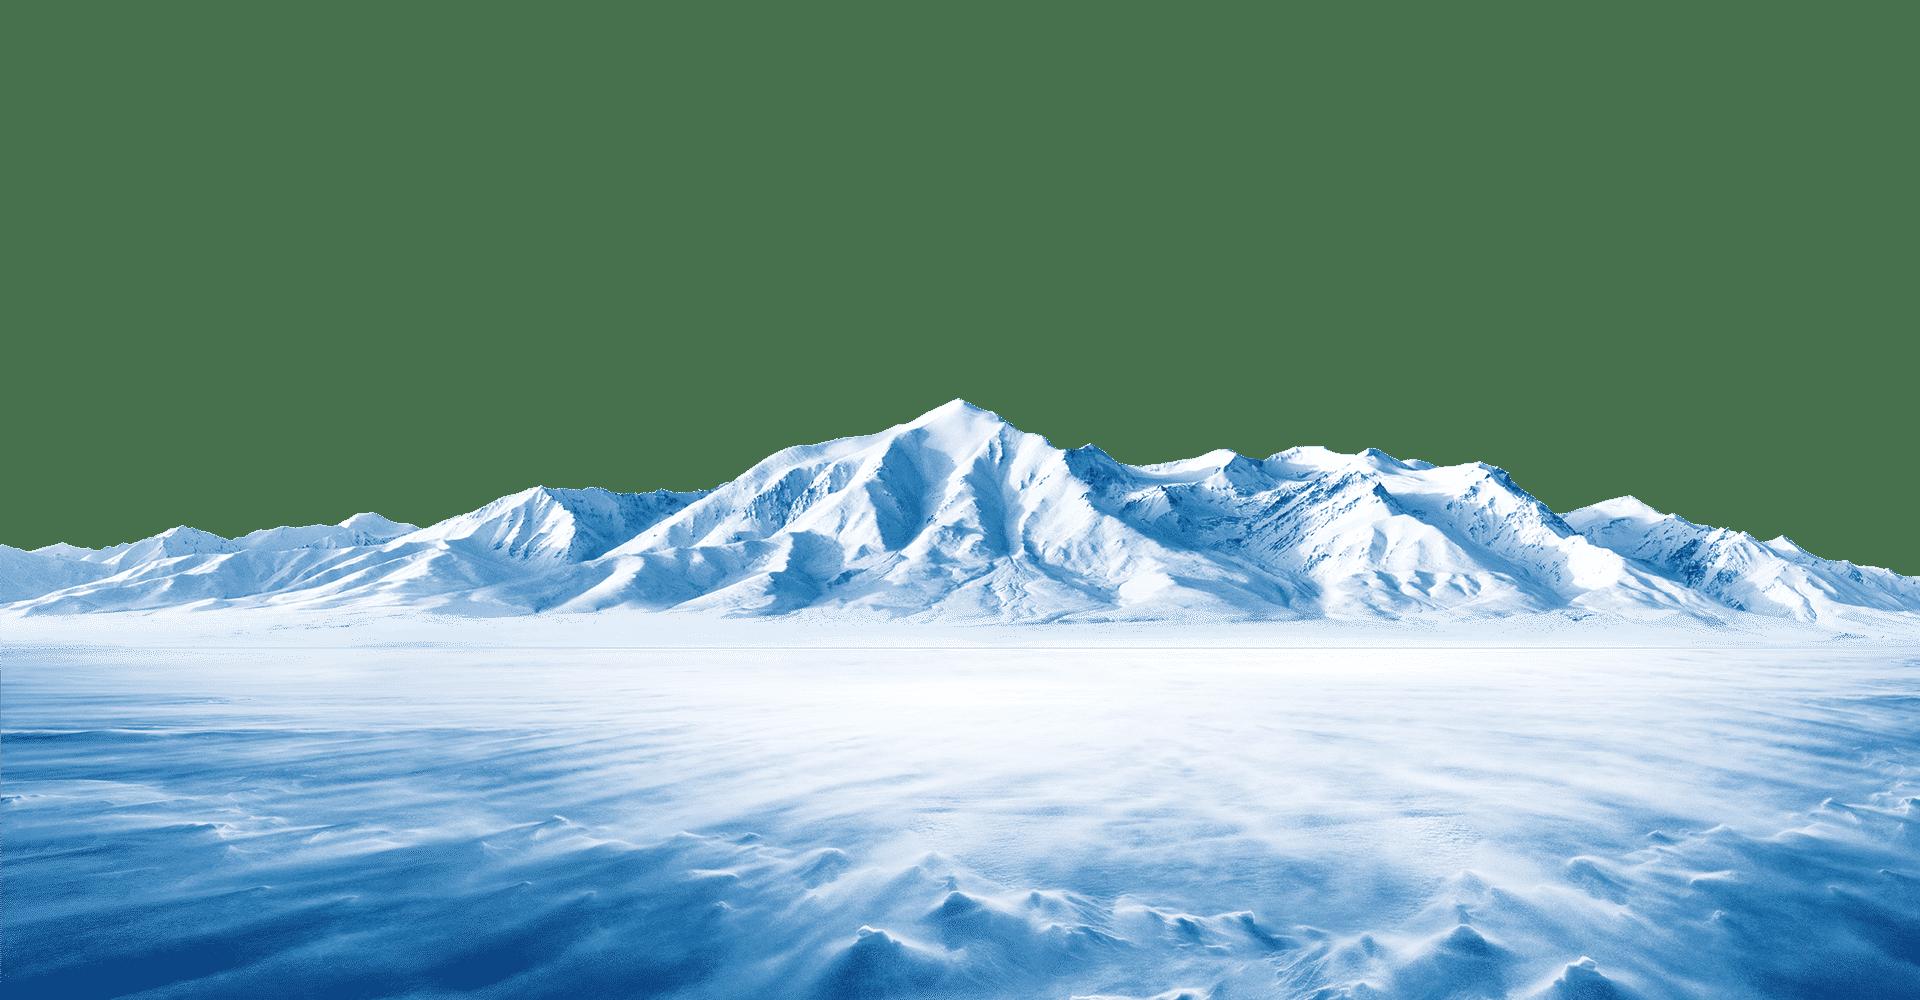 background-mountain-waves-caroline-garin-webdesign